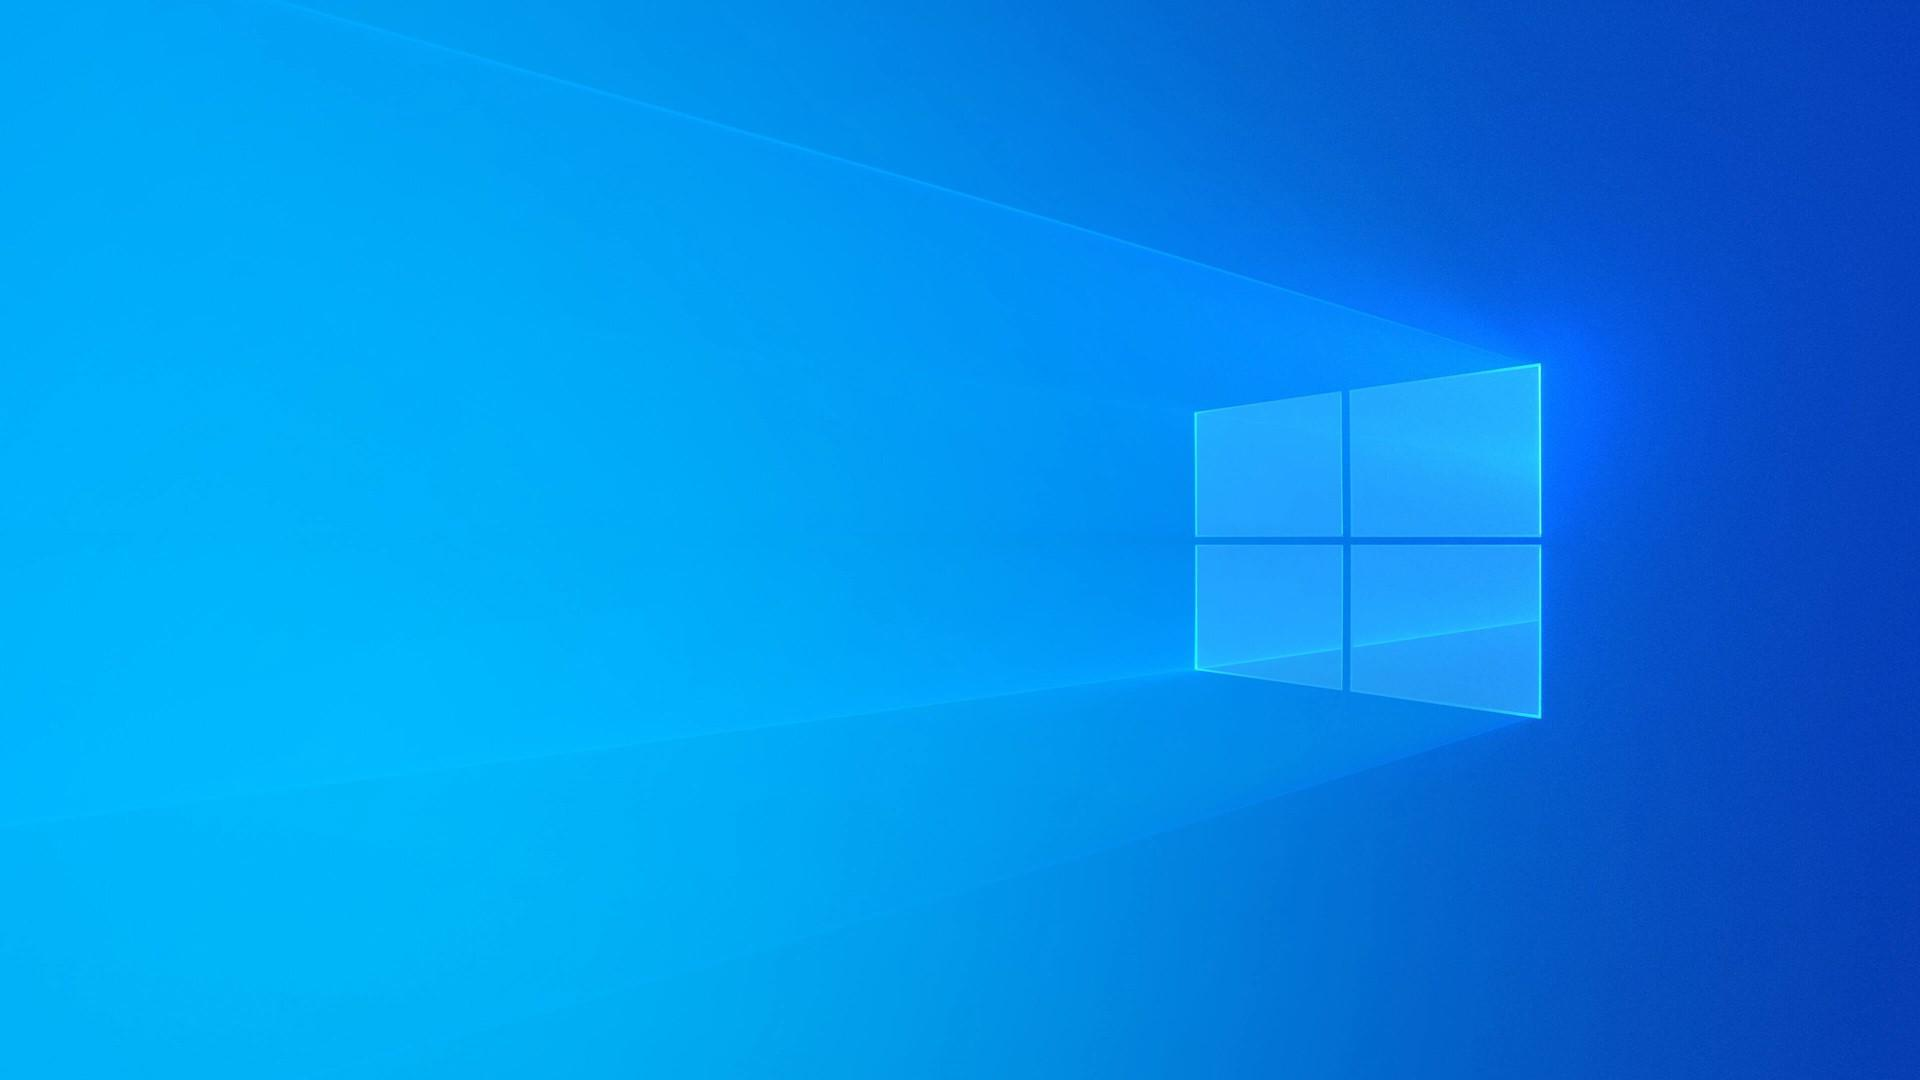 Windows 10 Pro Wallpapers Wallpaper Cave